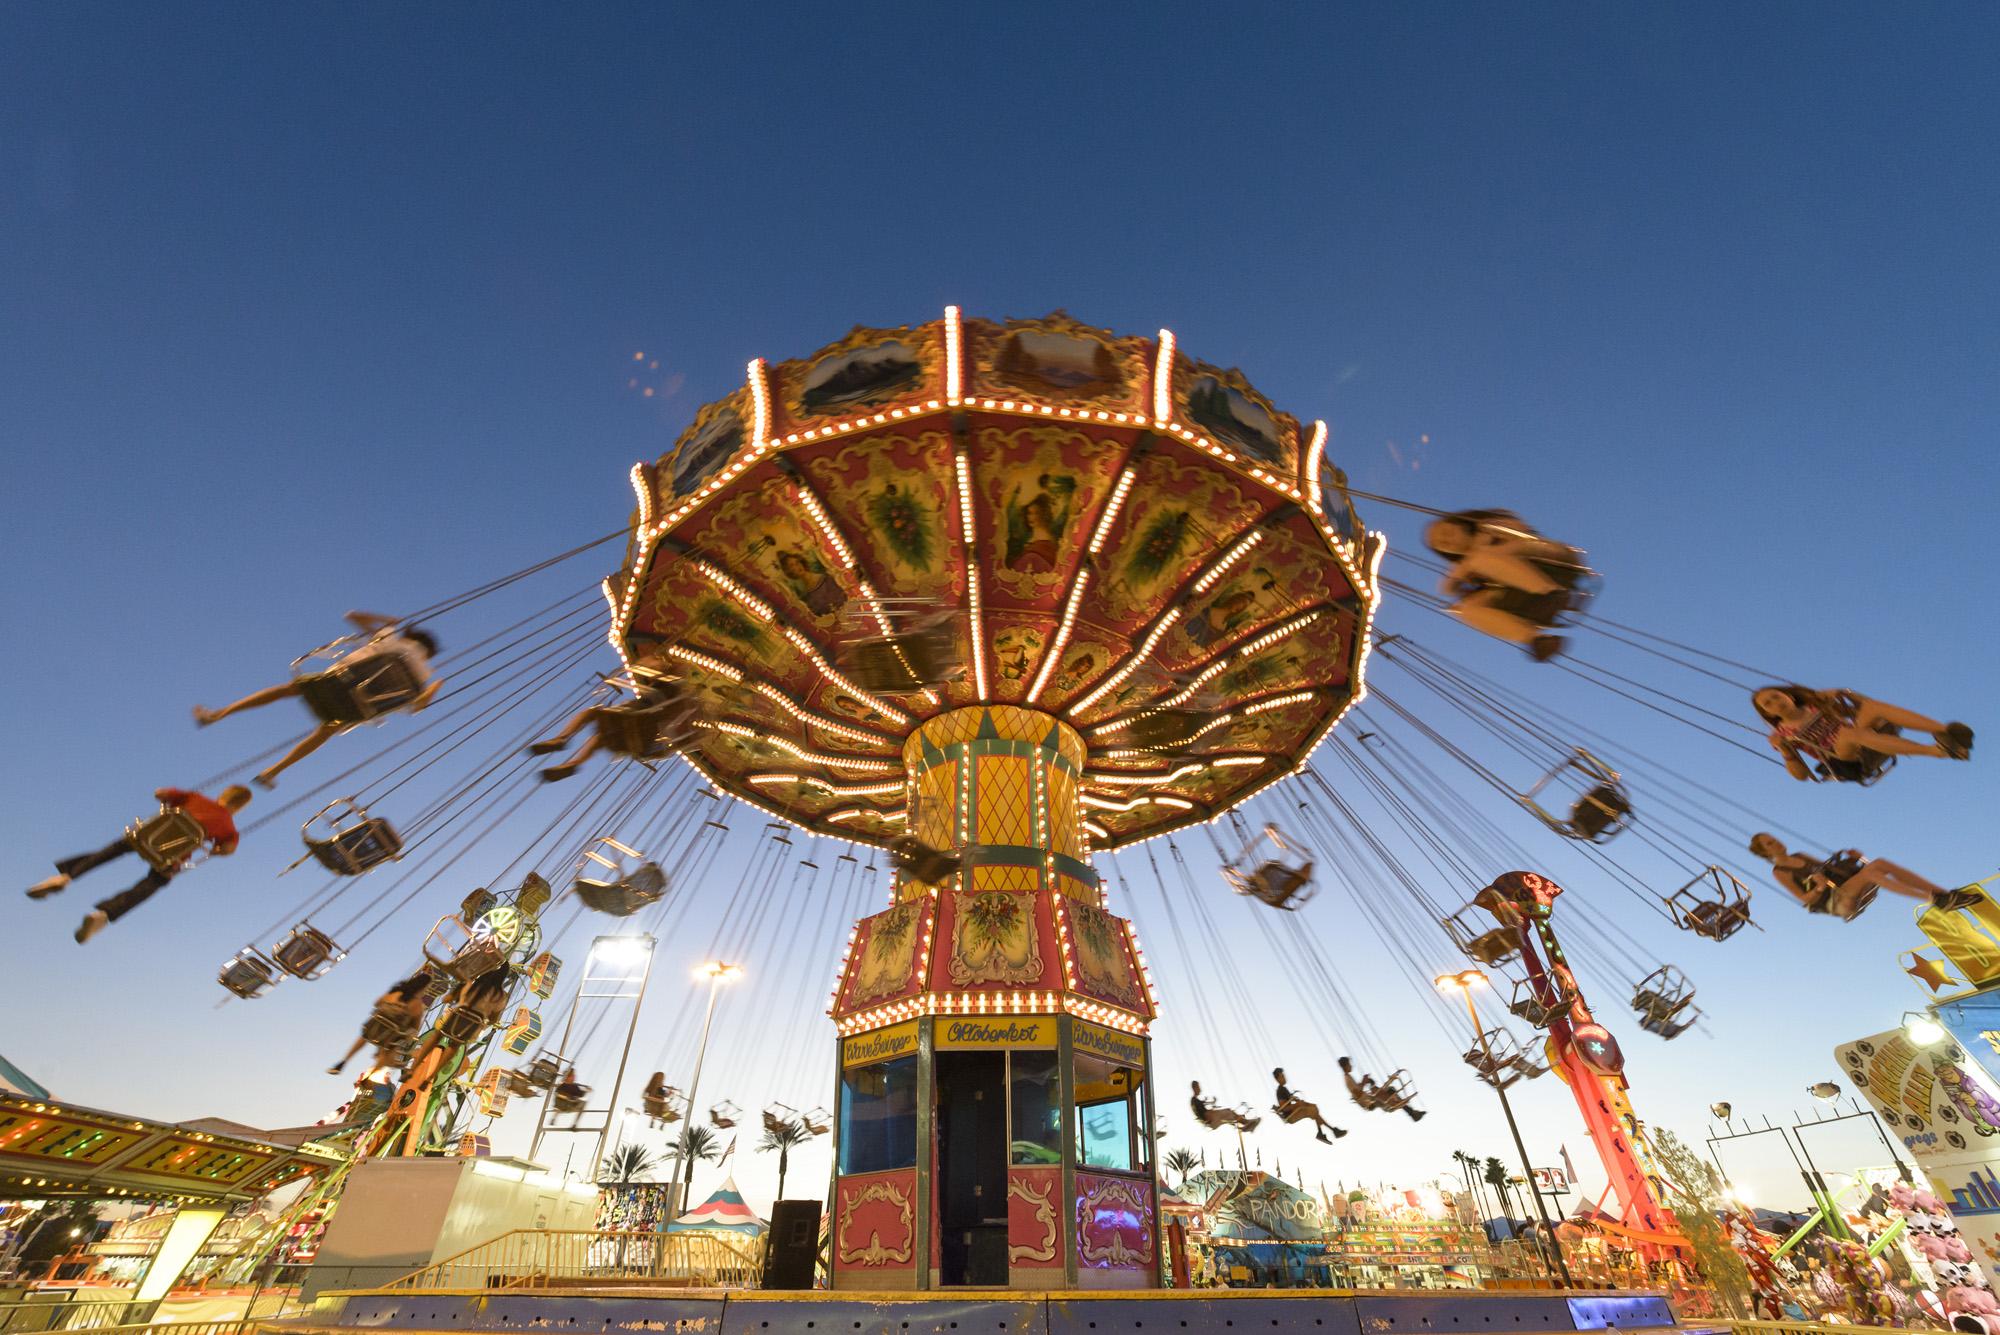 Carnival - Rides